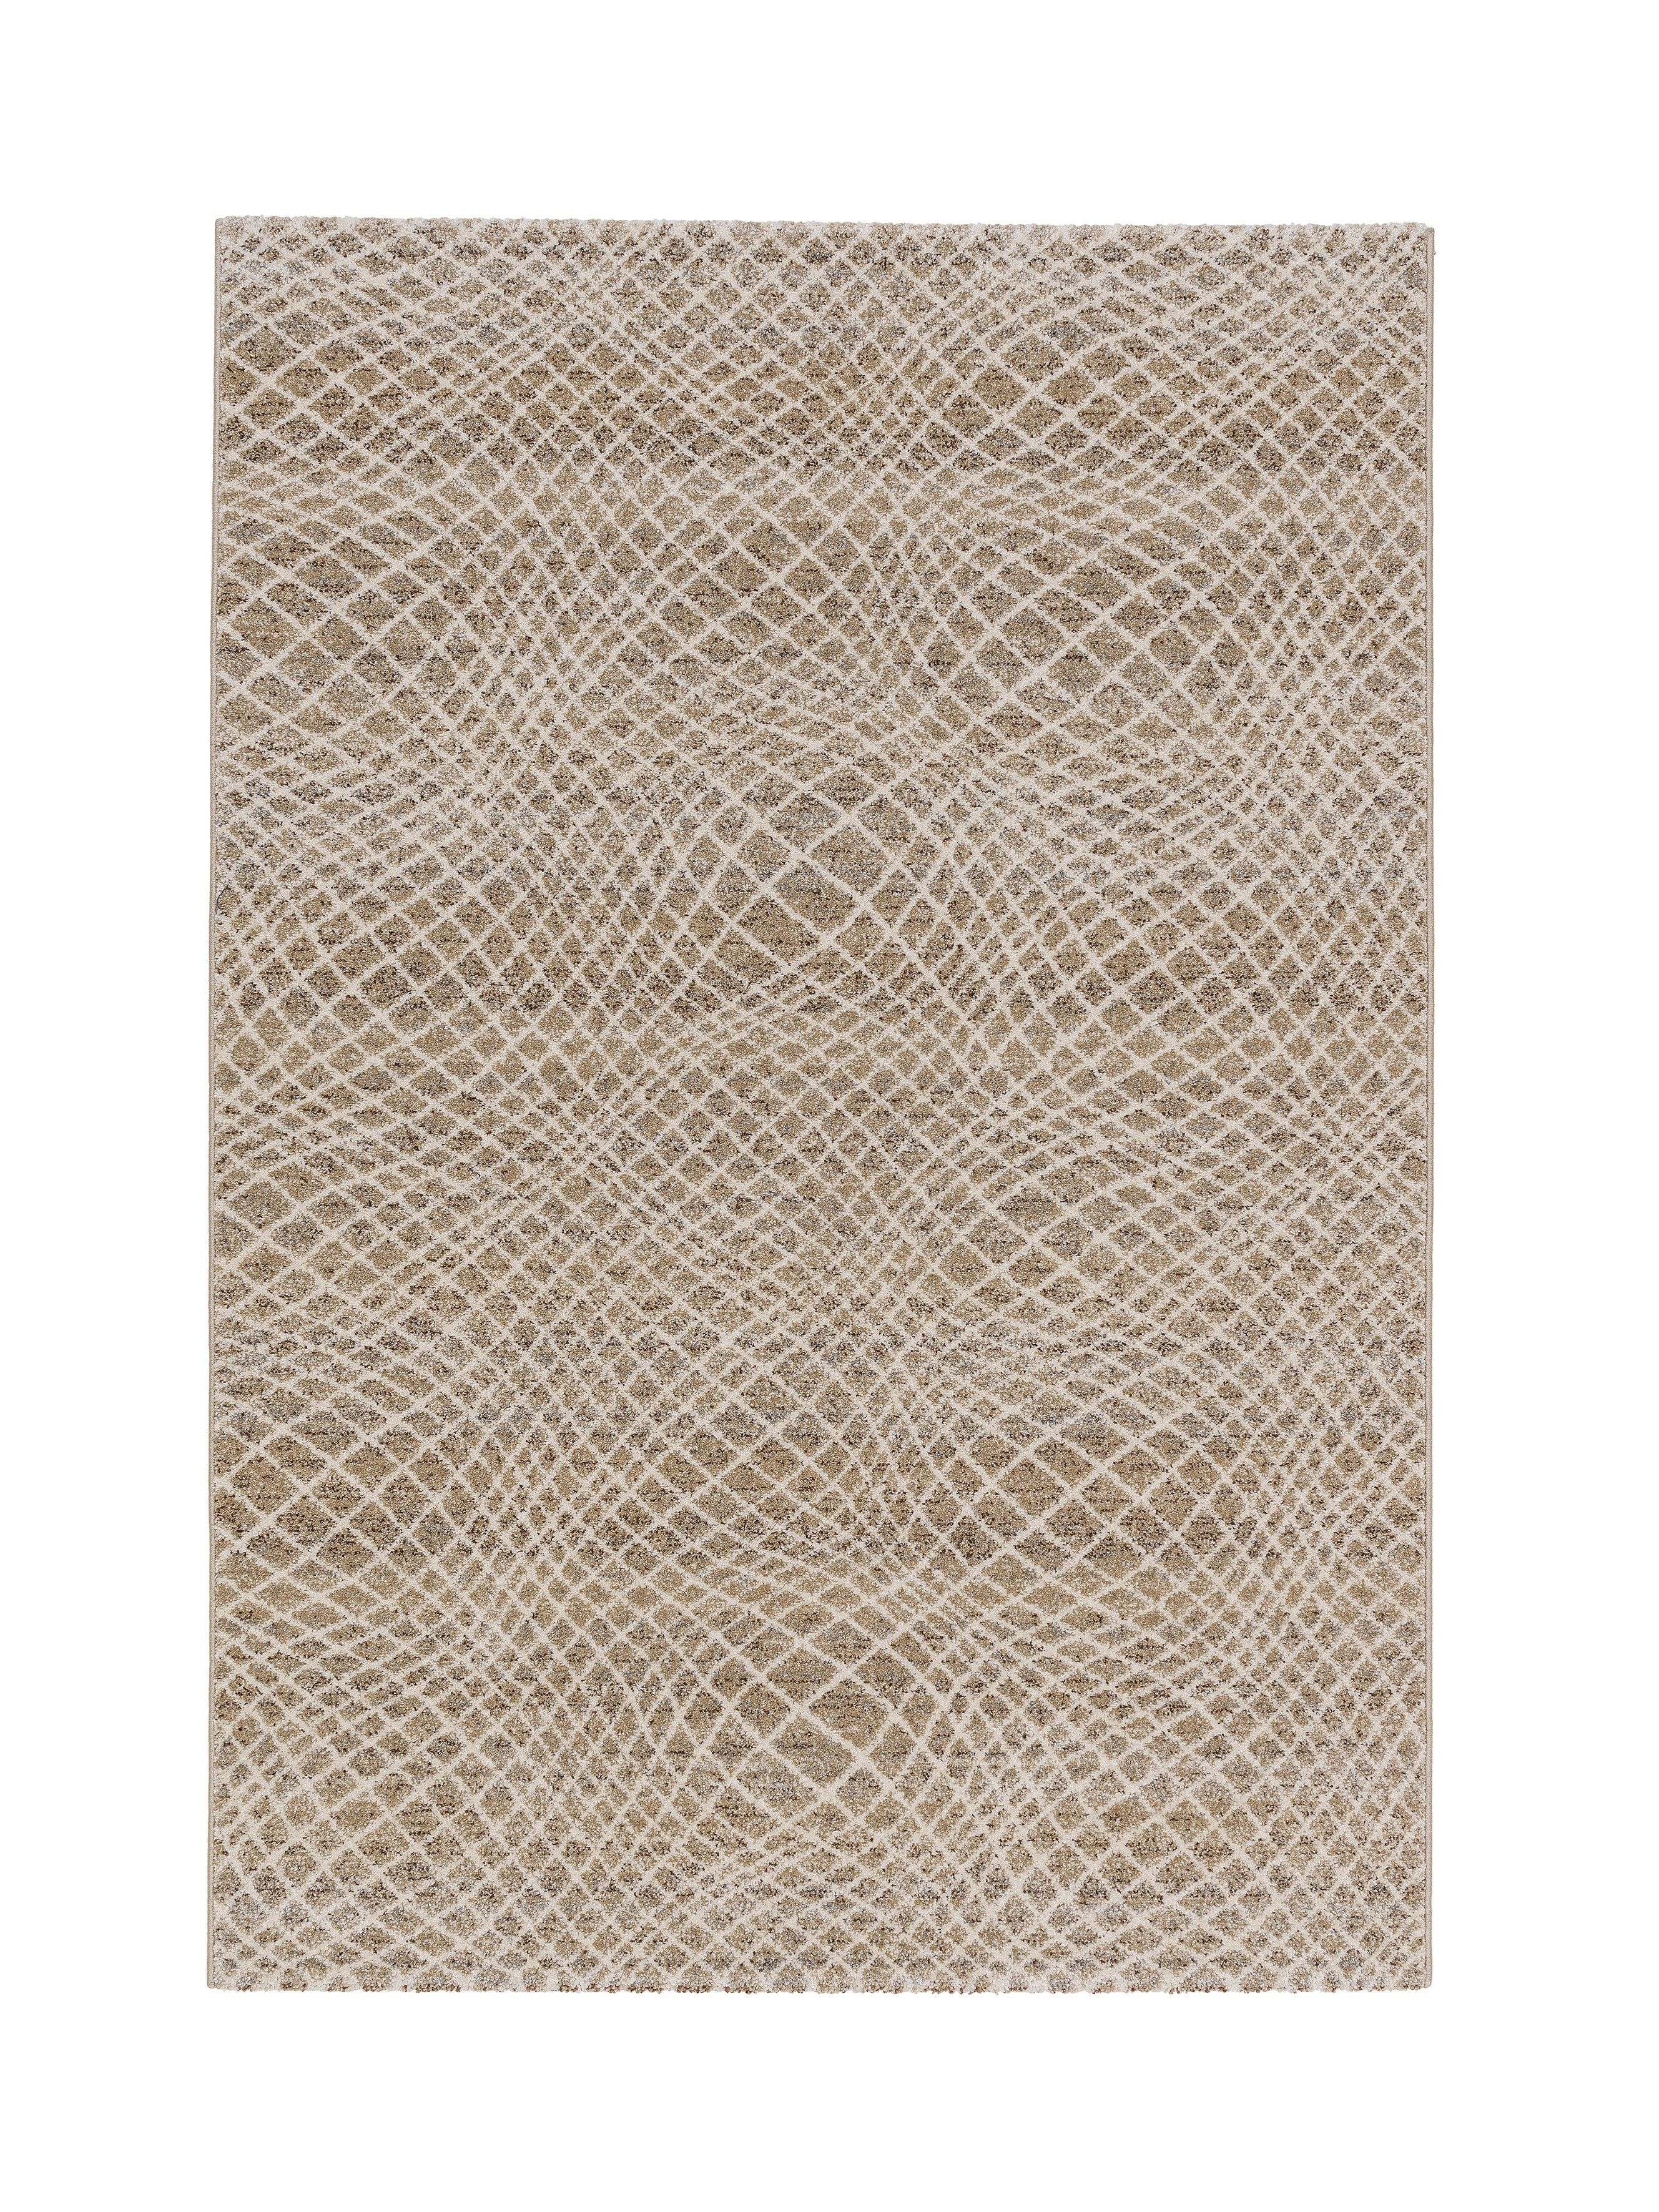 Astra - Golze koberce Kusový koberec Carpi 151006 Stripes Beige - 133x190 cm